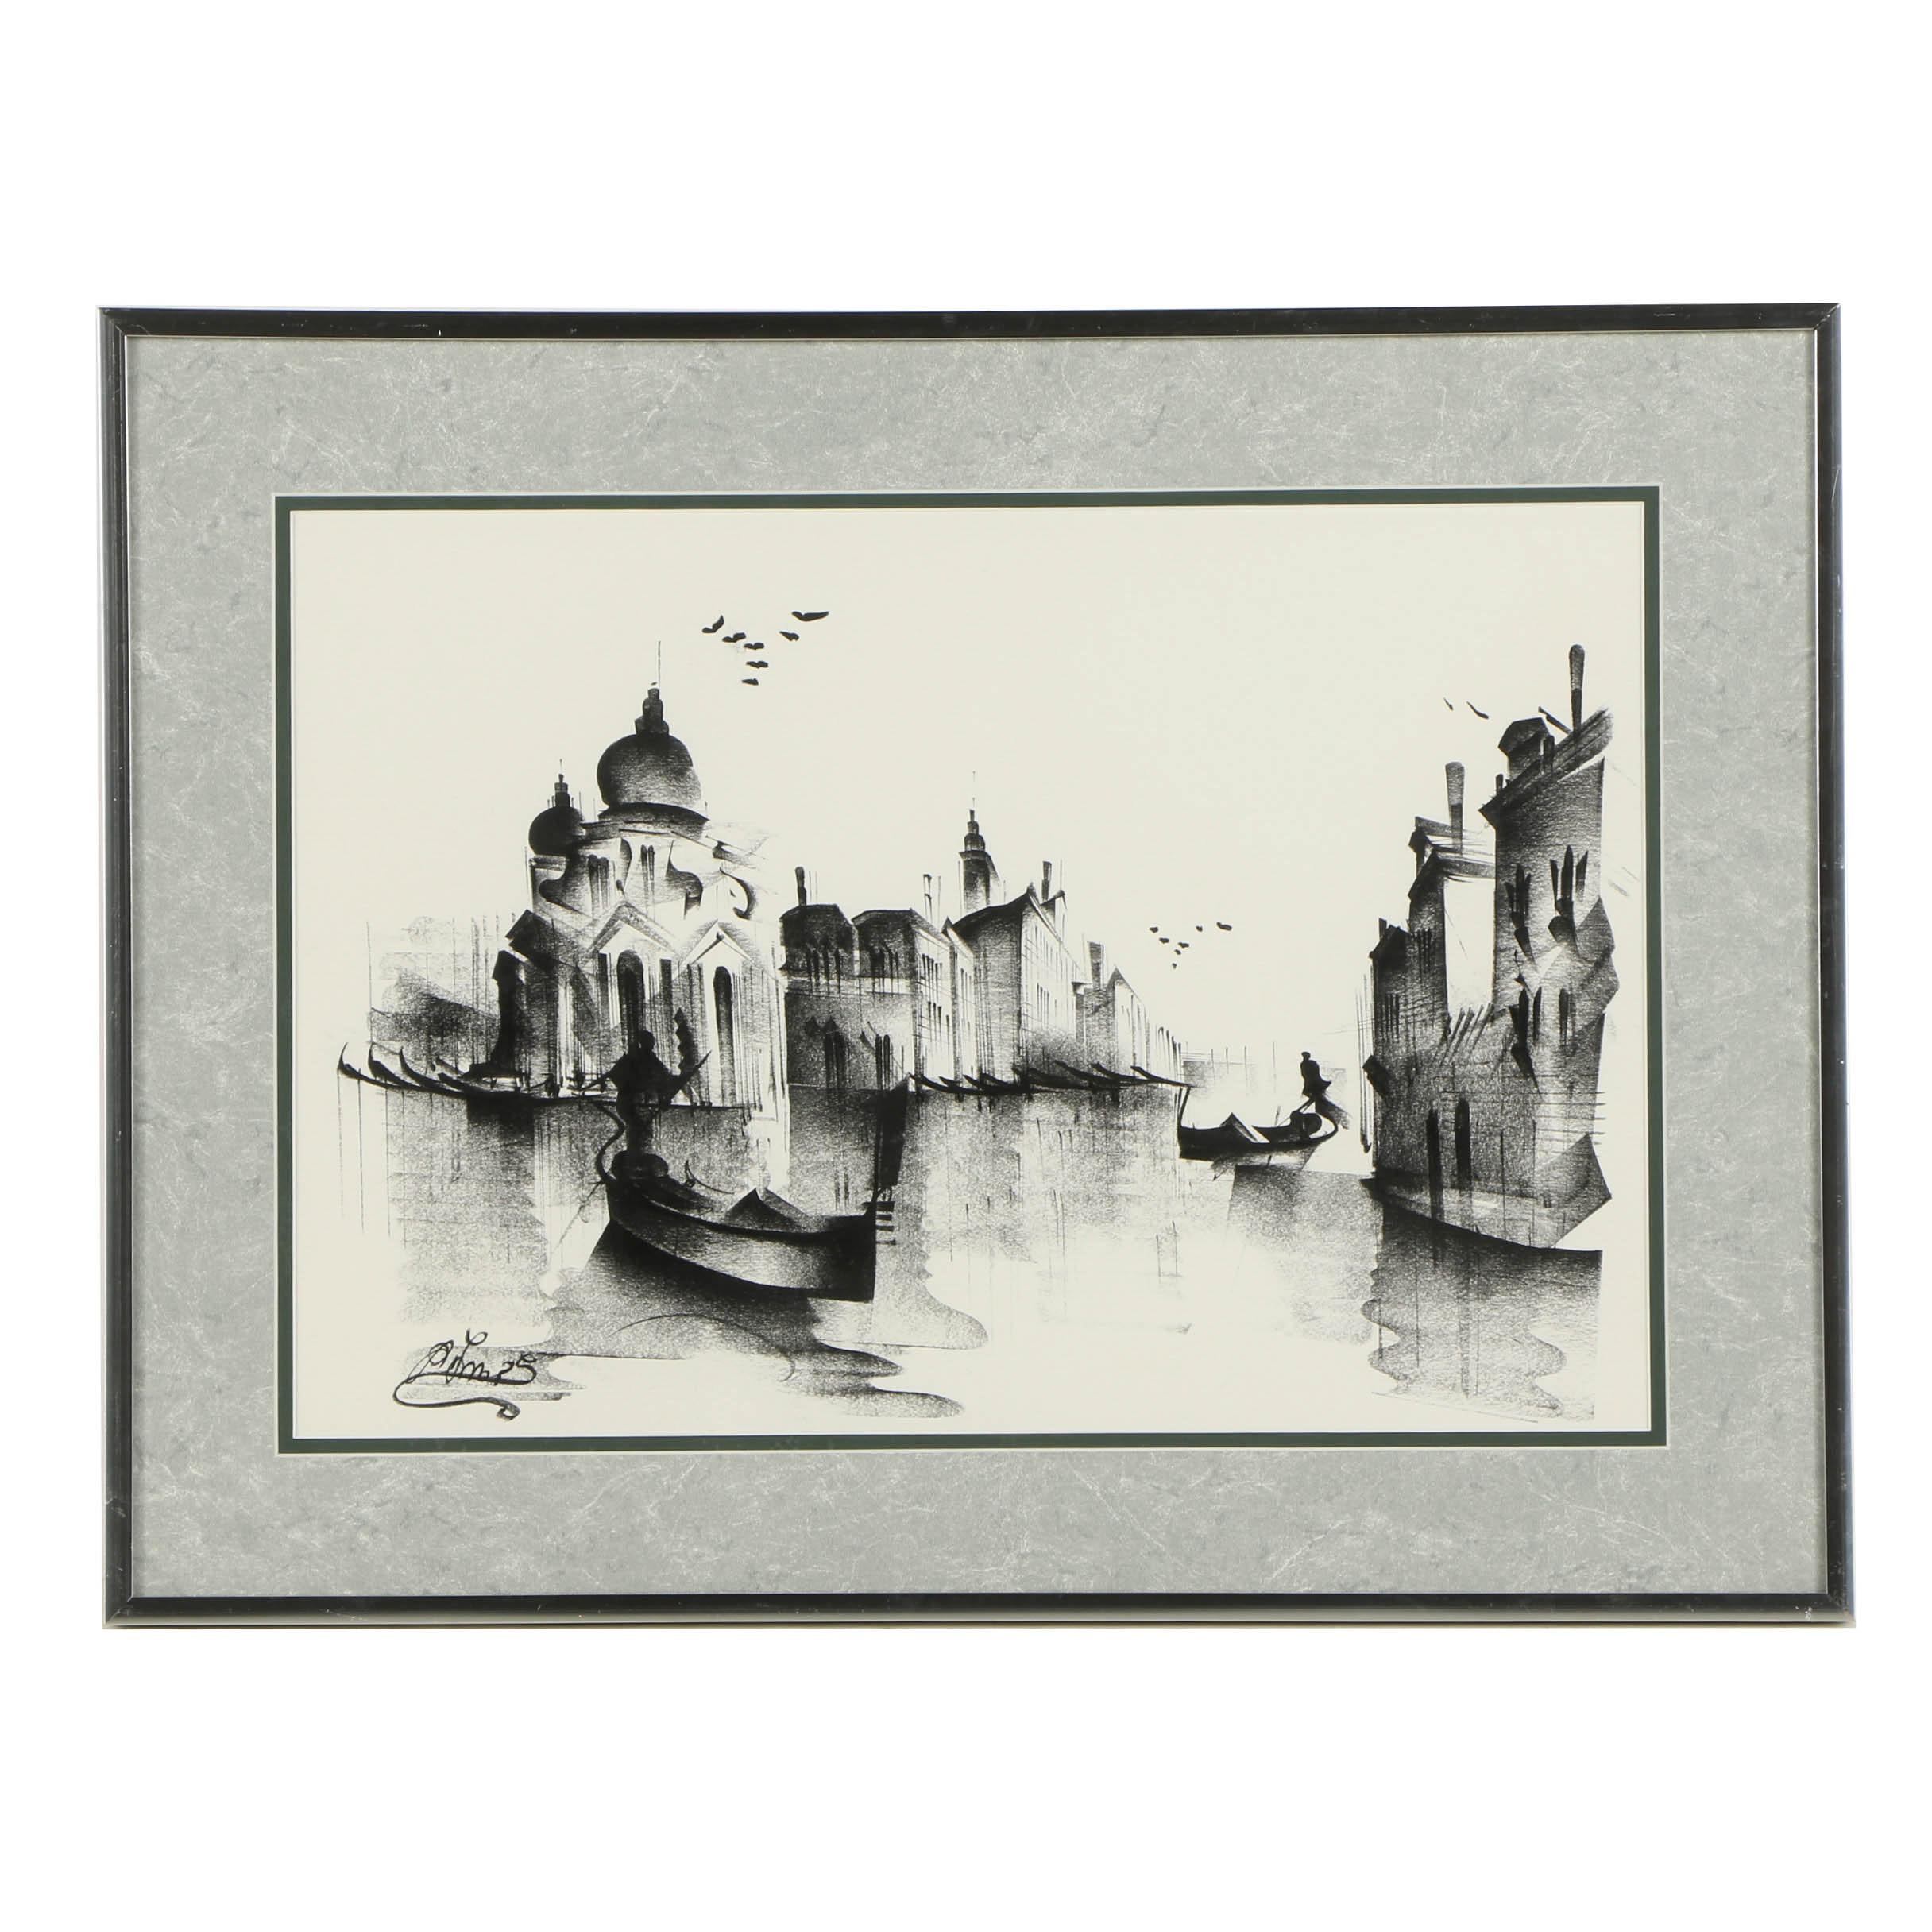 Ink Drawing of Venetian Scene